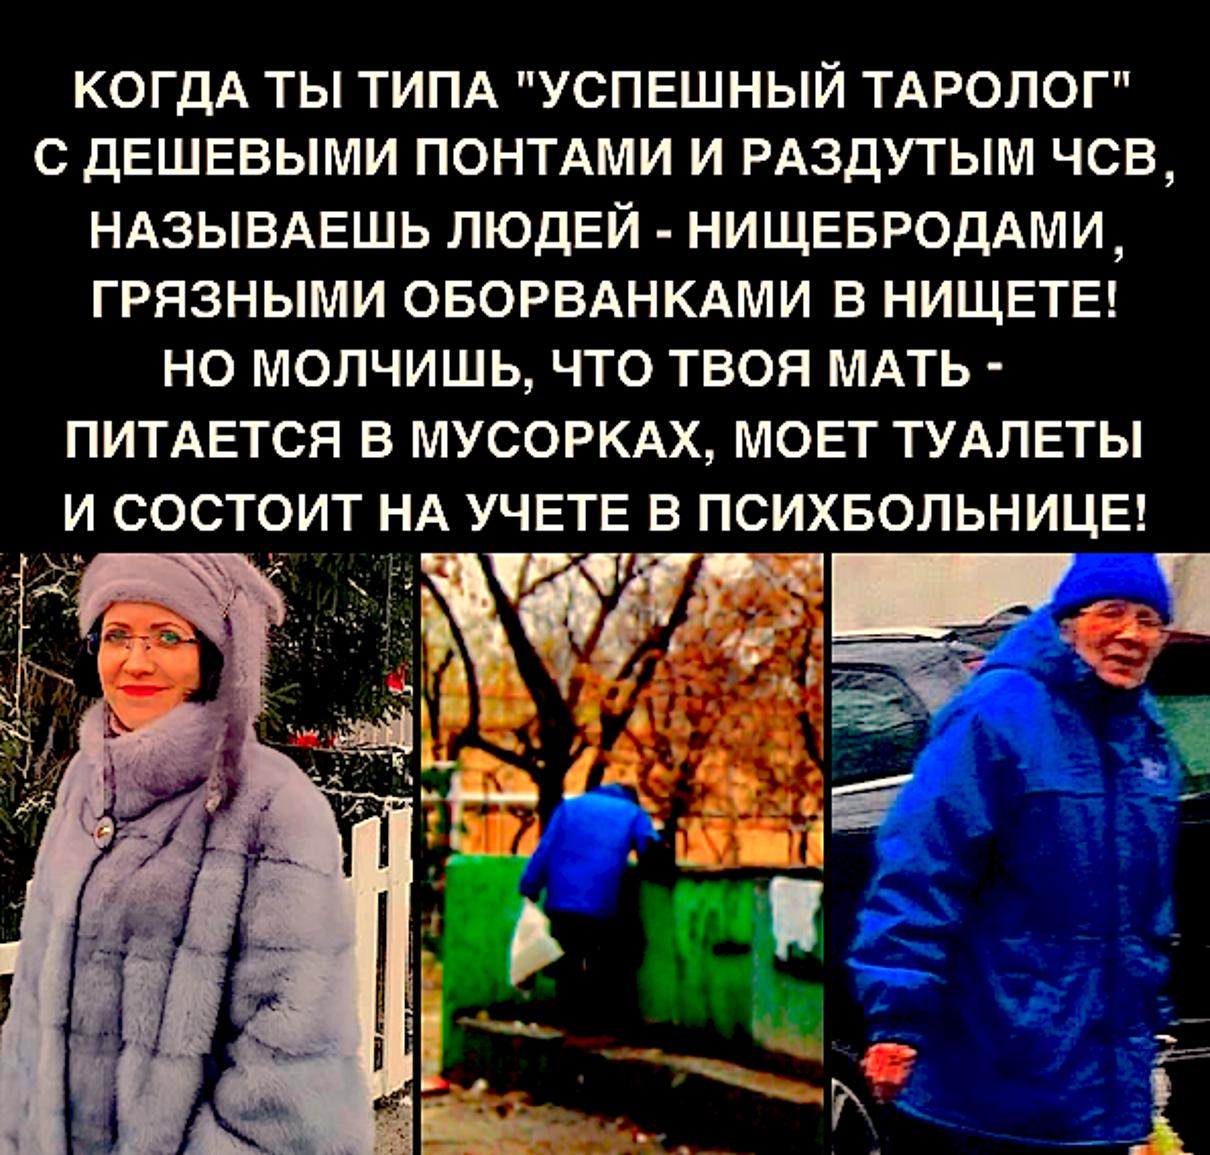 Жалоба-отзыв: Октябрина Жемчужина - Октябрина Жемчужина - мошенница!.  Фото №3